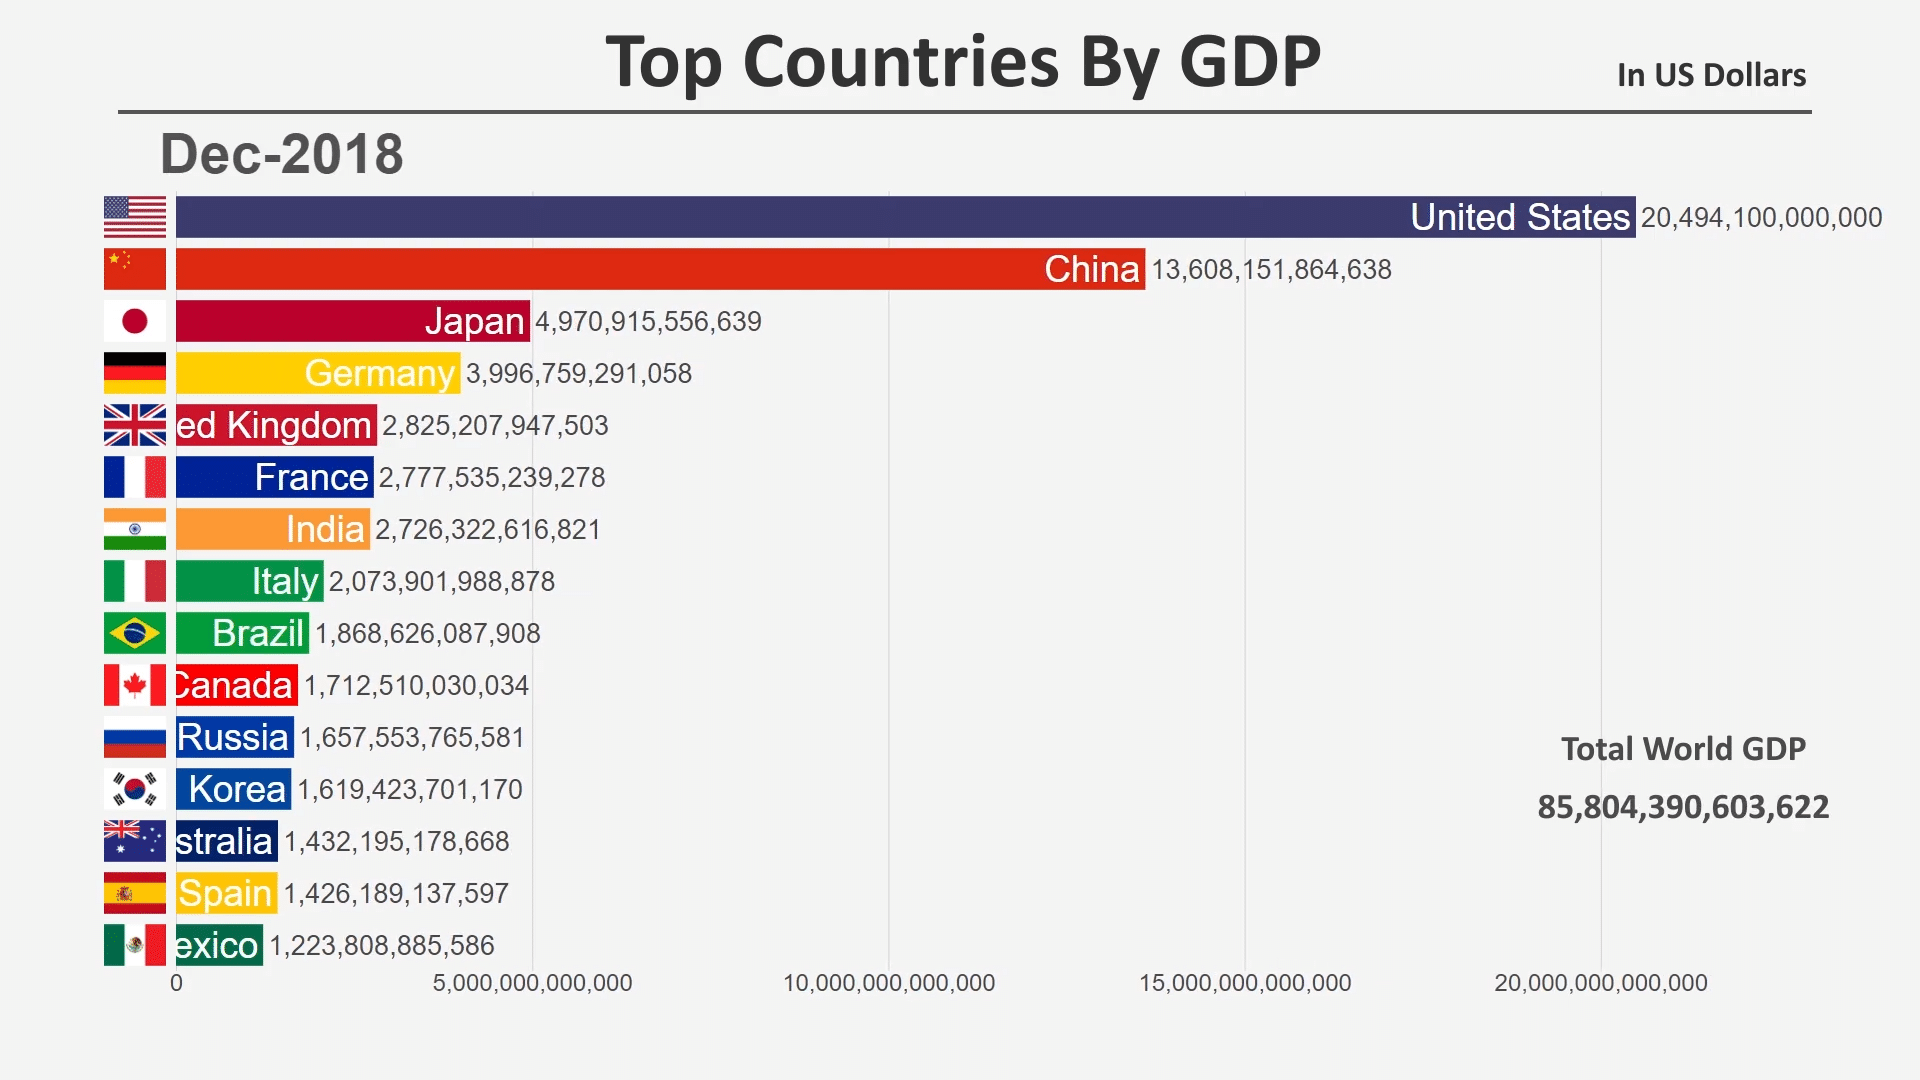 Топ-15 стран по ВВП (1960-2018)